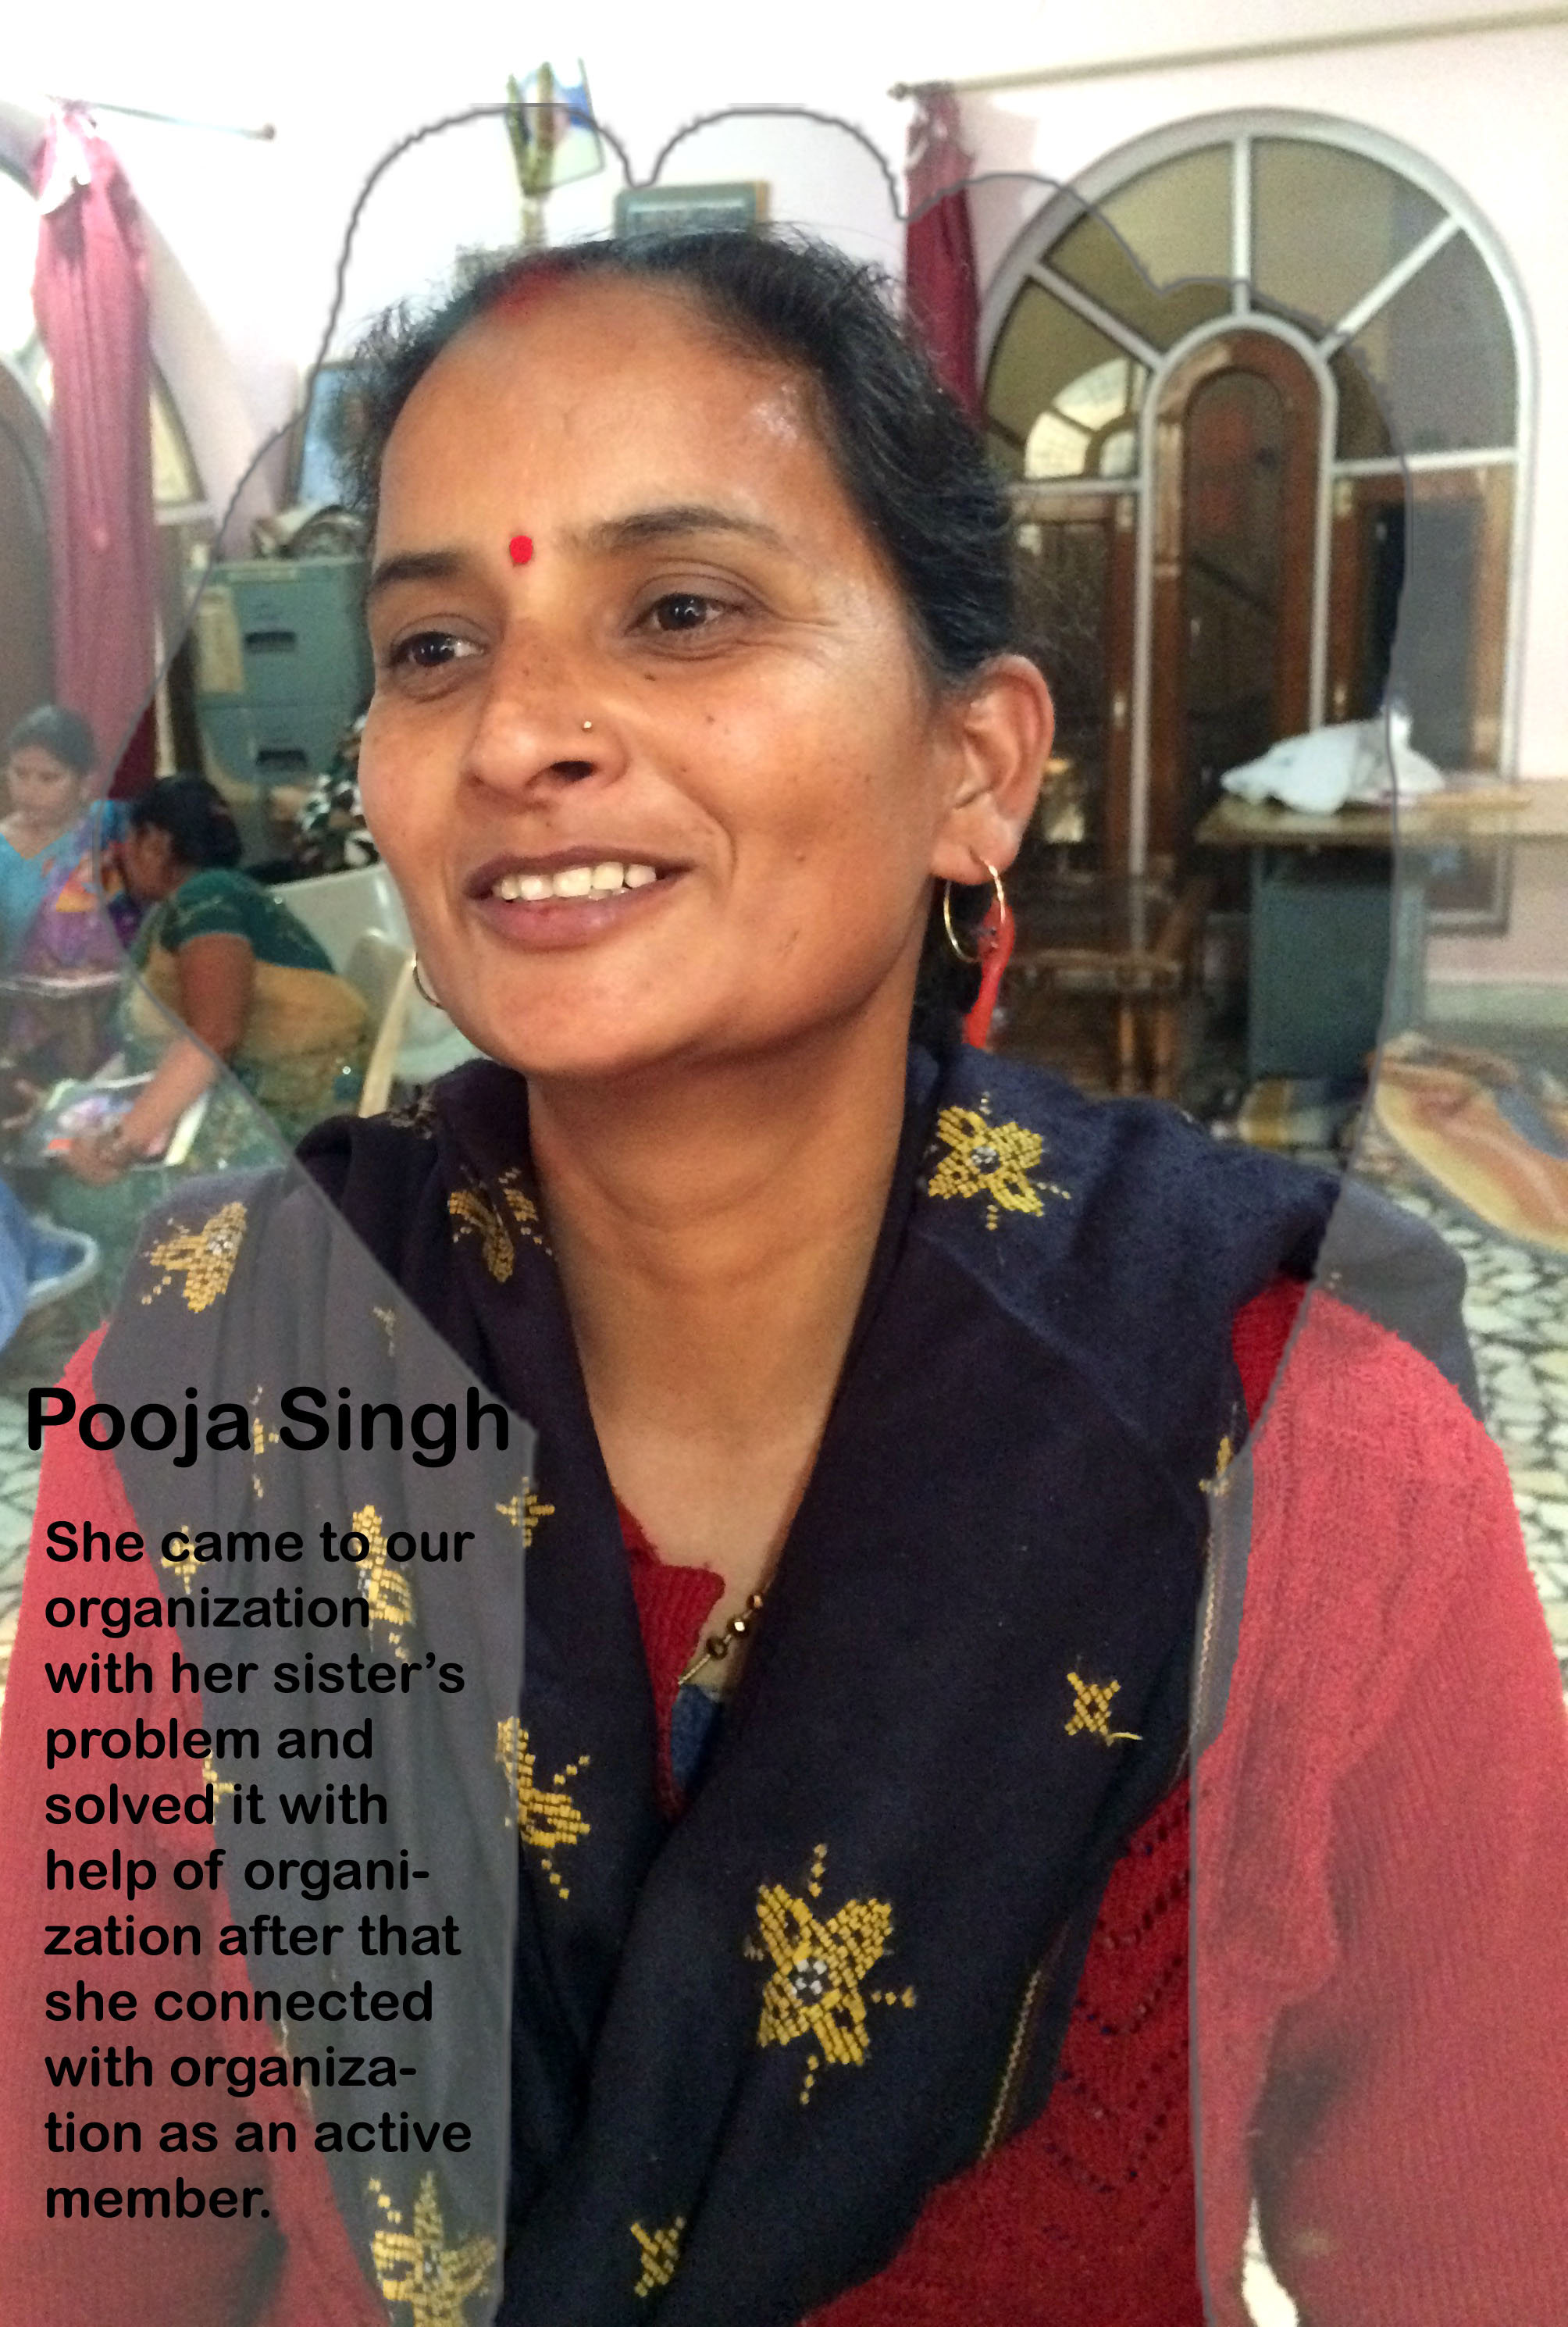 Puja singh women human ritht defender--.jpg